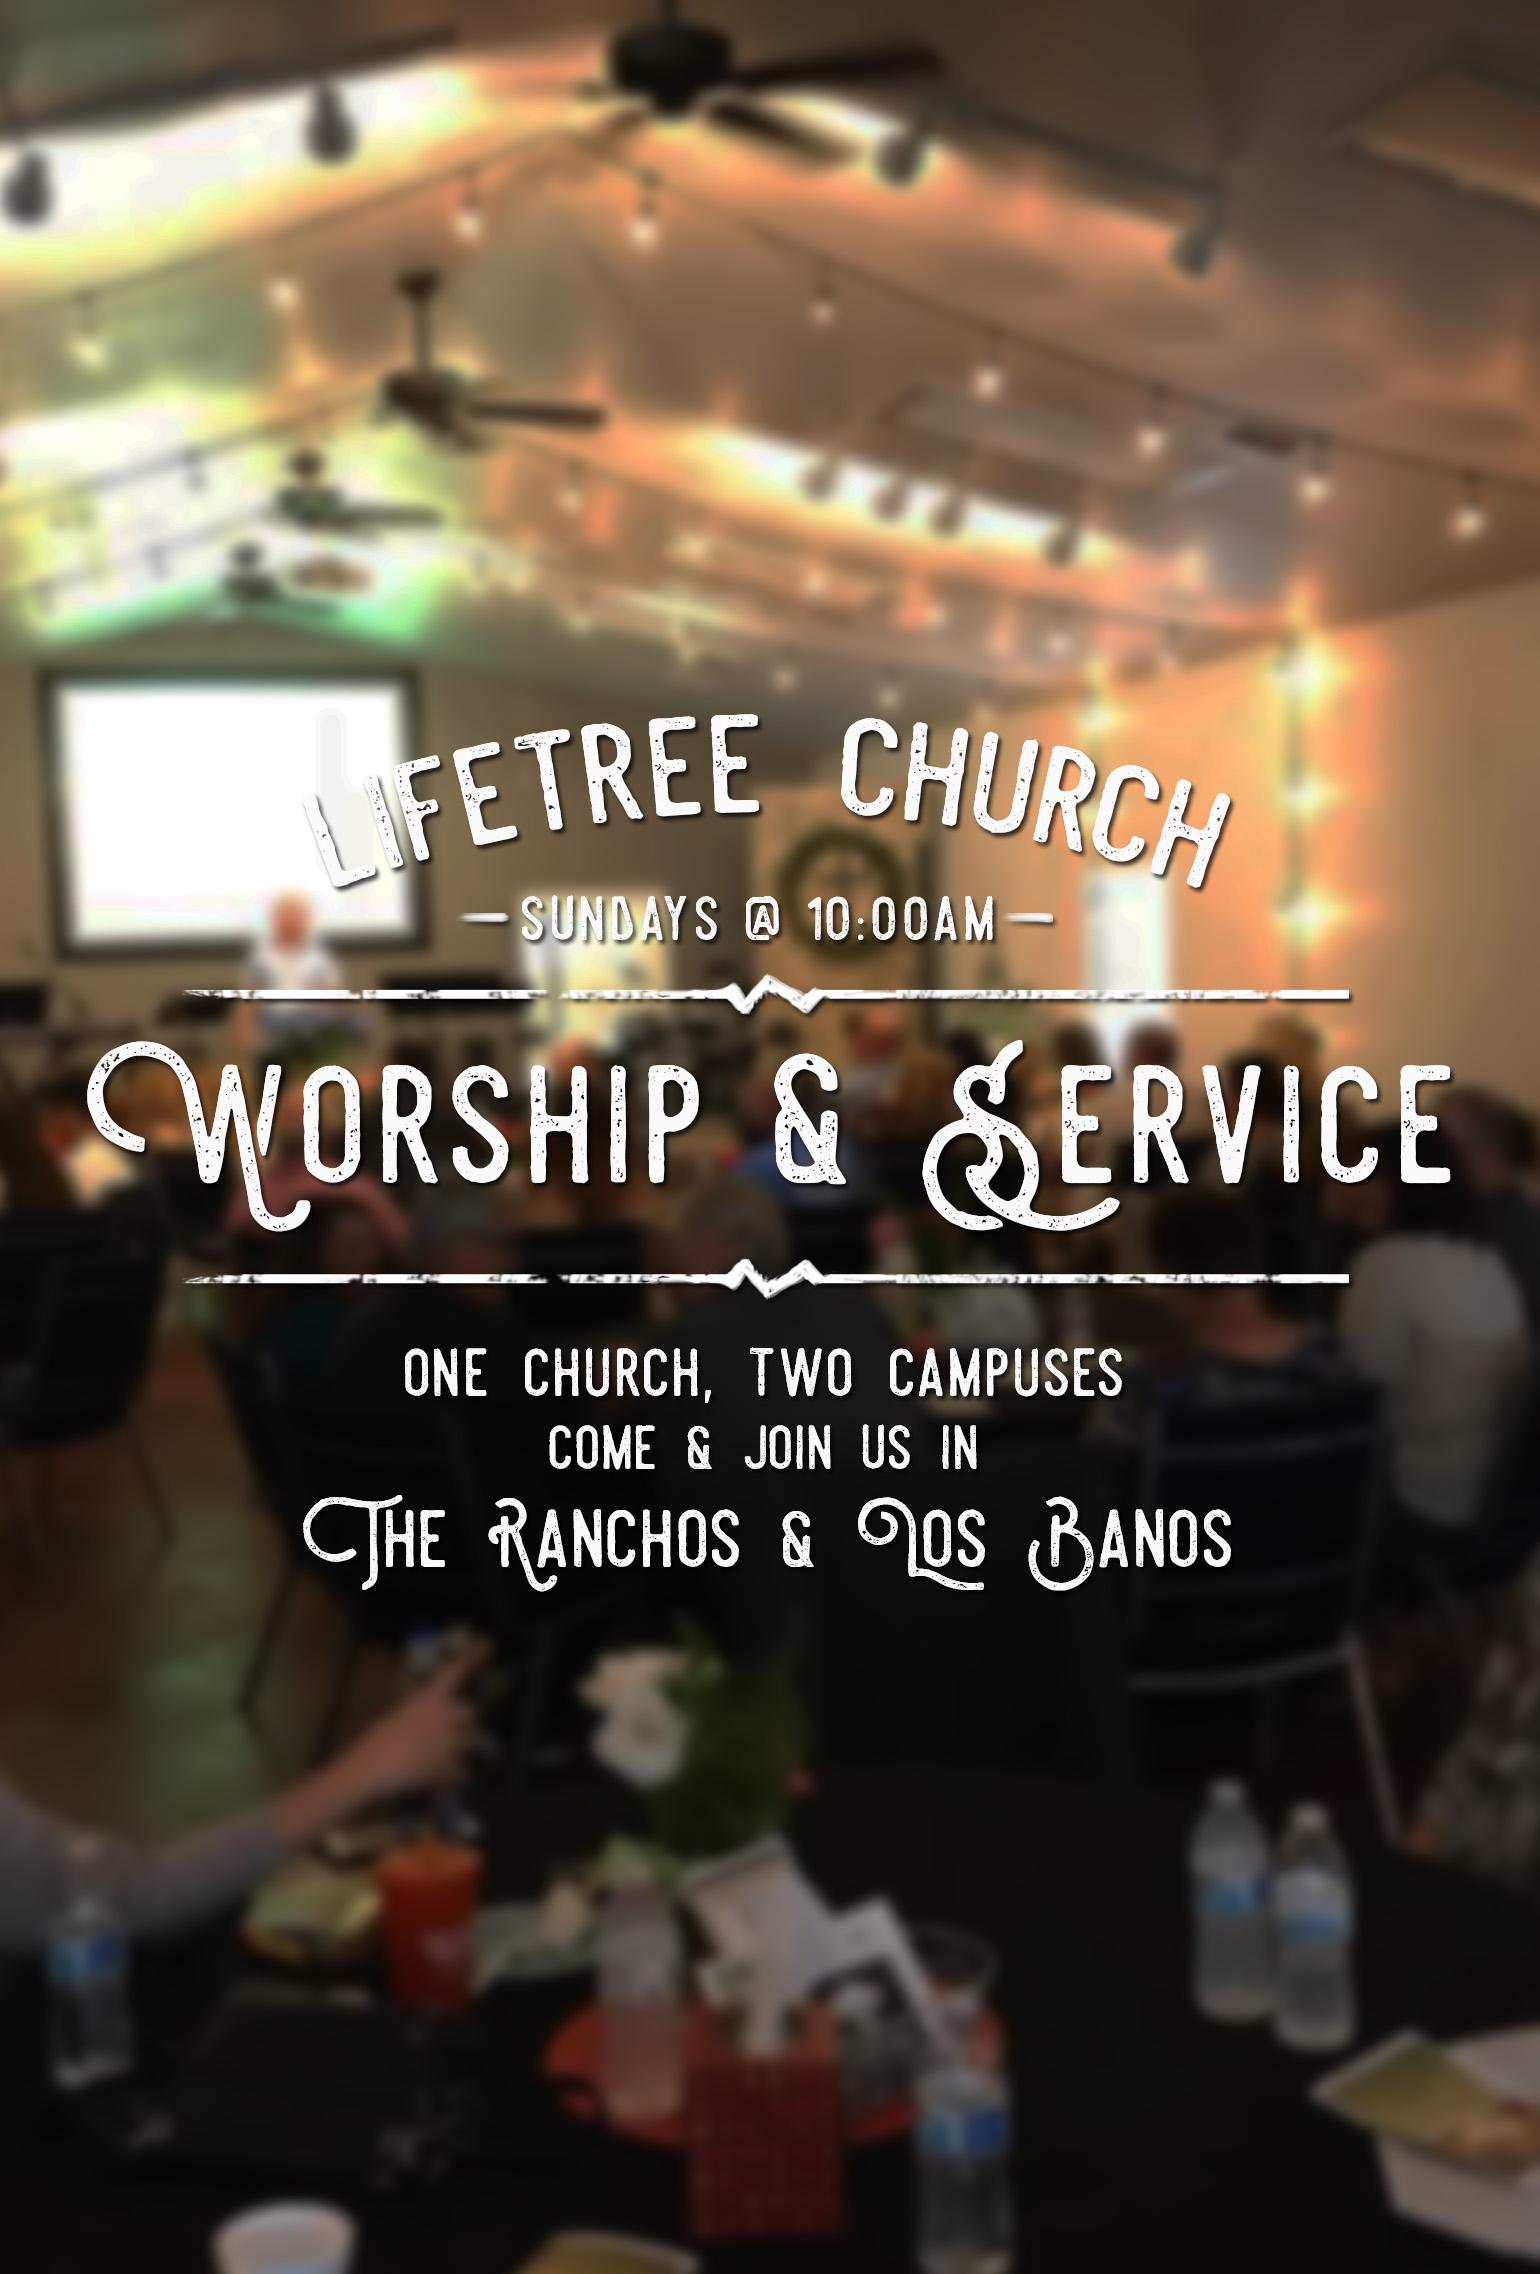 worship&service.jpg